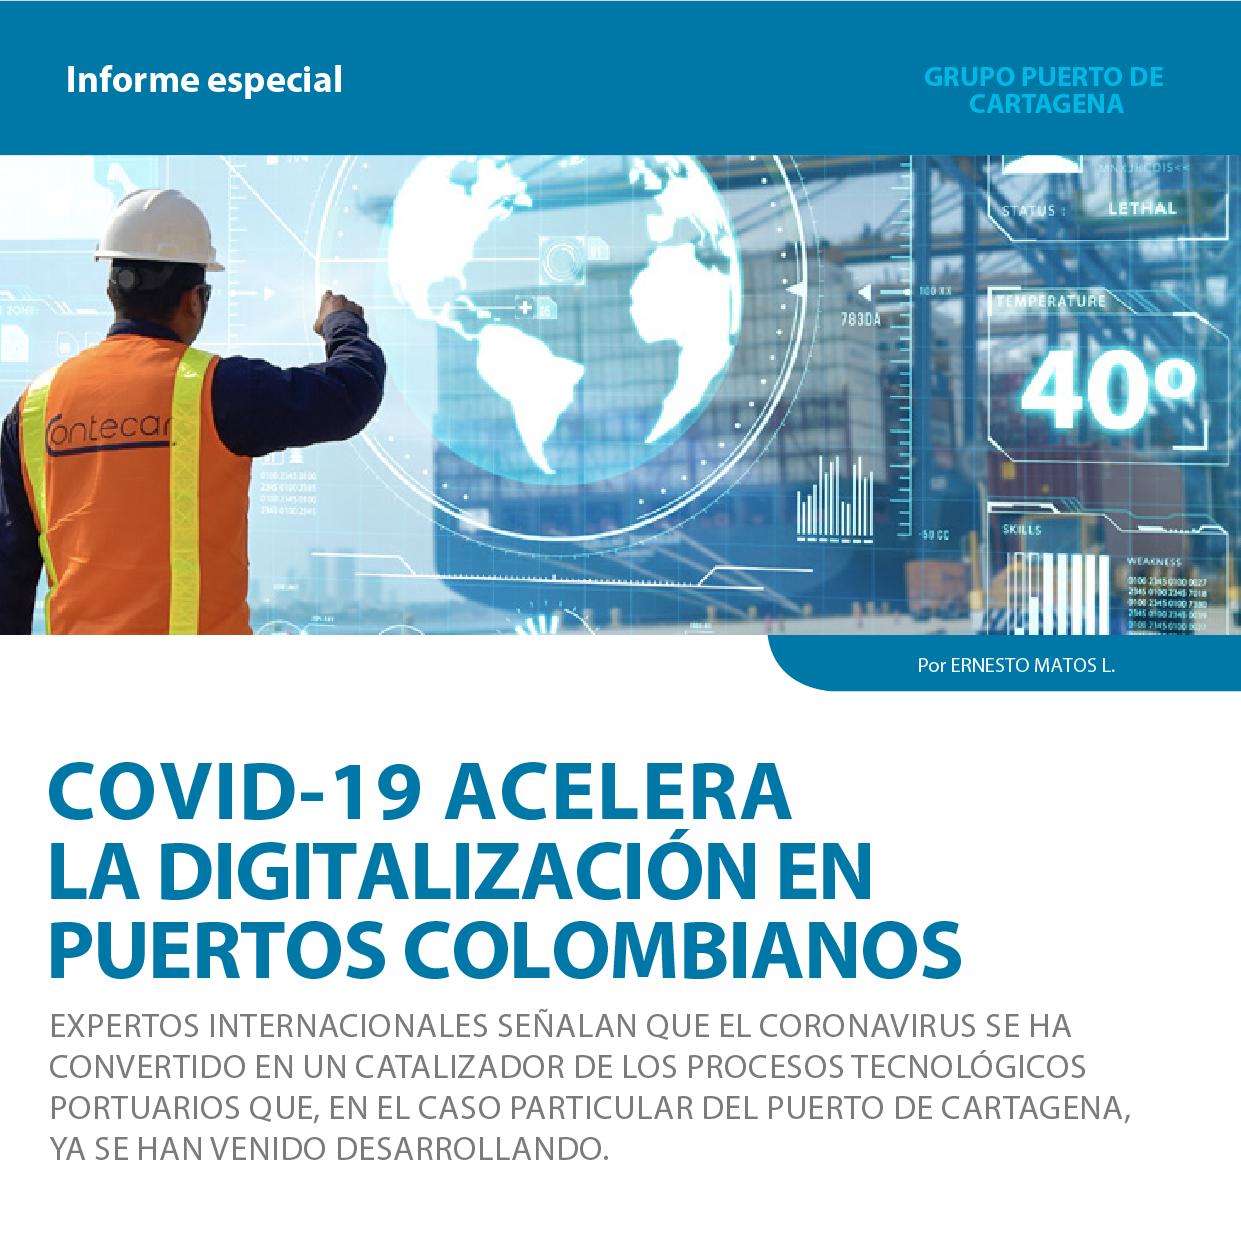 covid19-acelera-digitalizacion-puertos